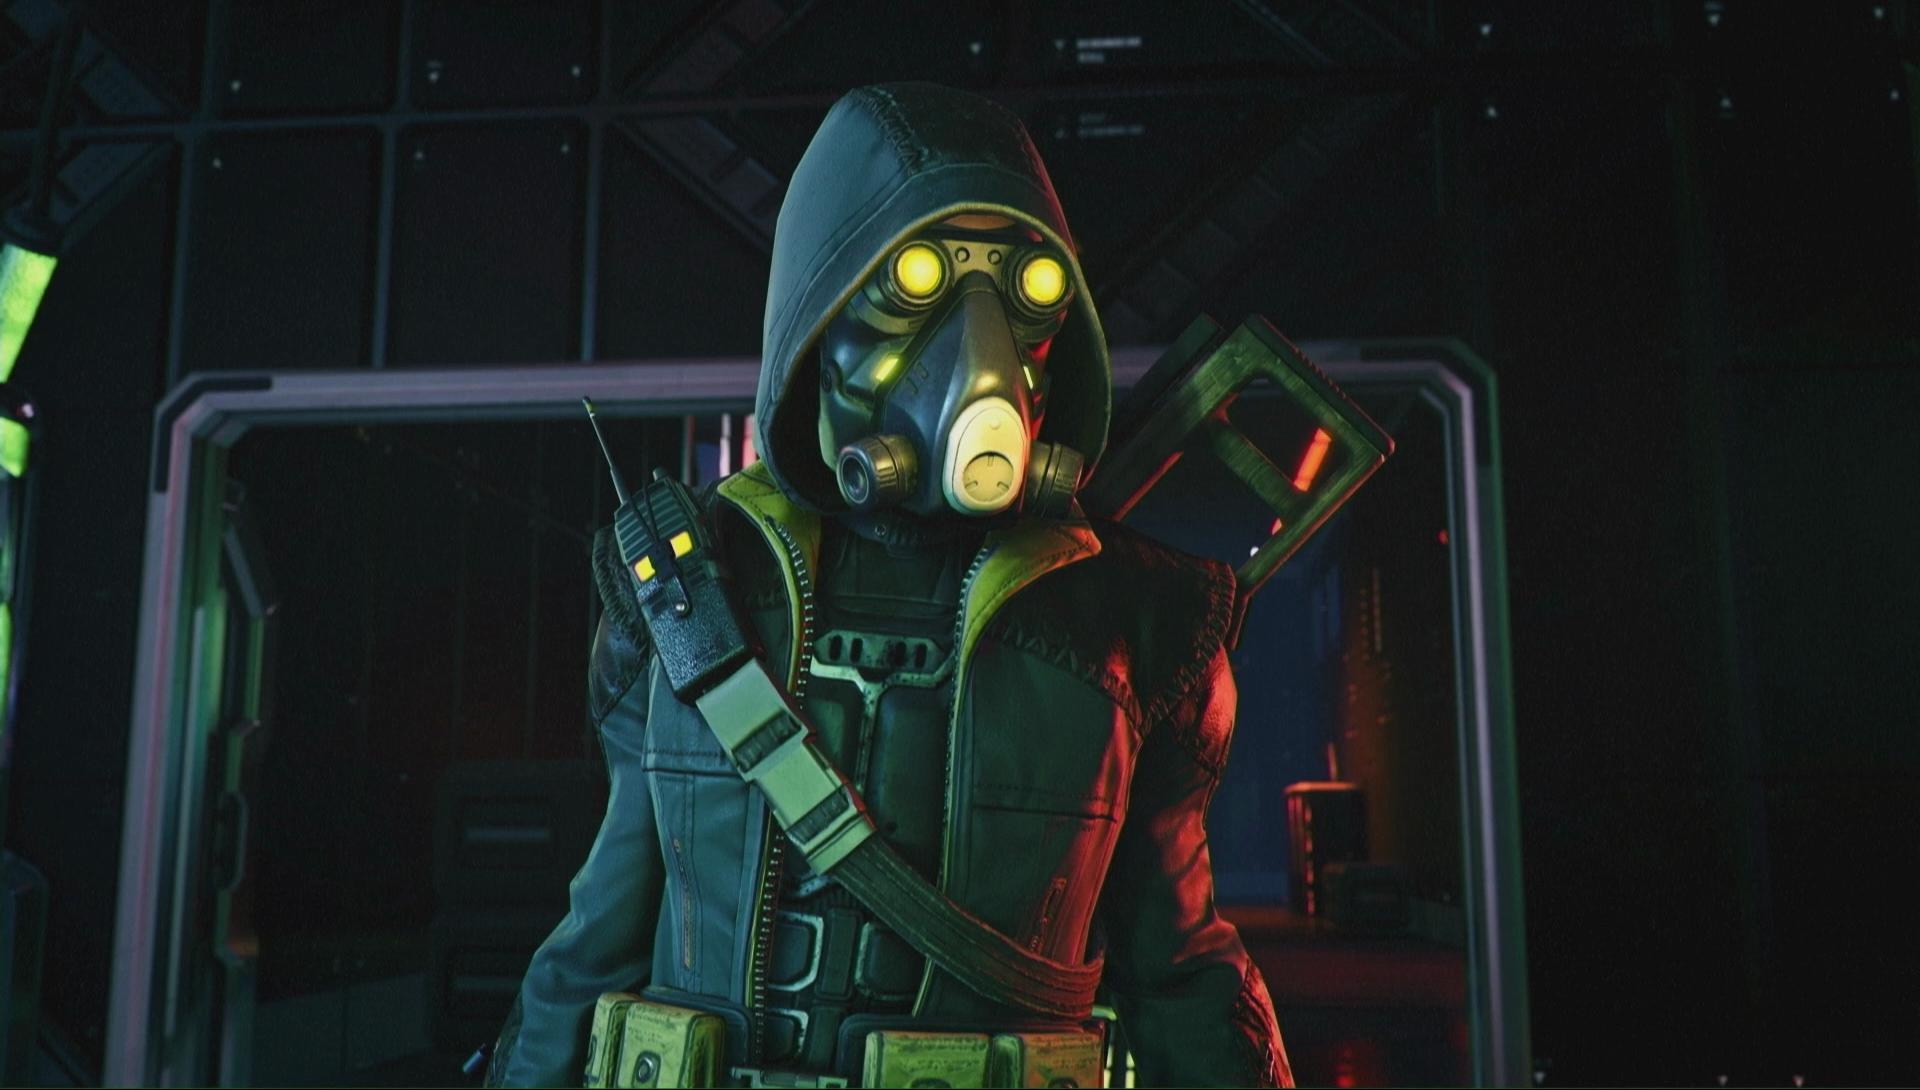 XCOM 2: War of the Chosen announced at E3 2017